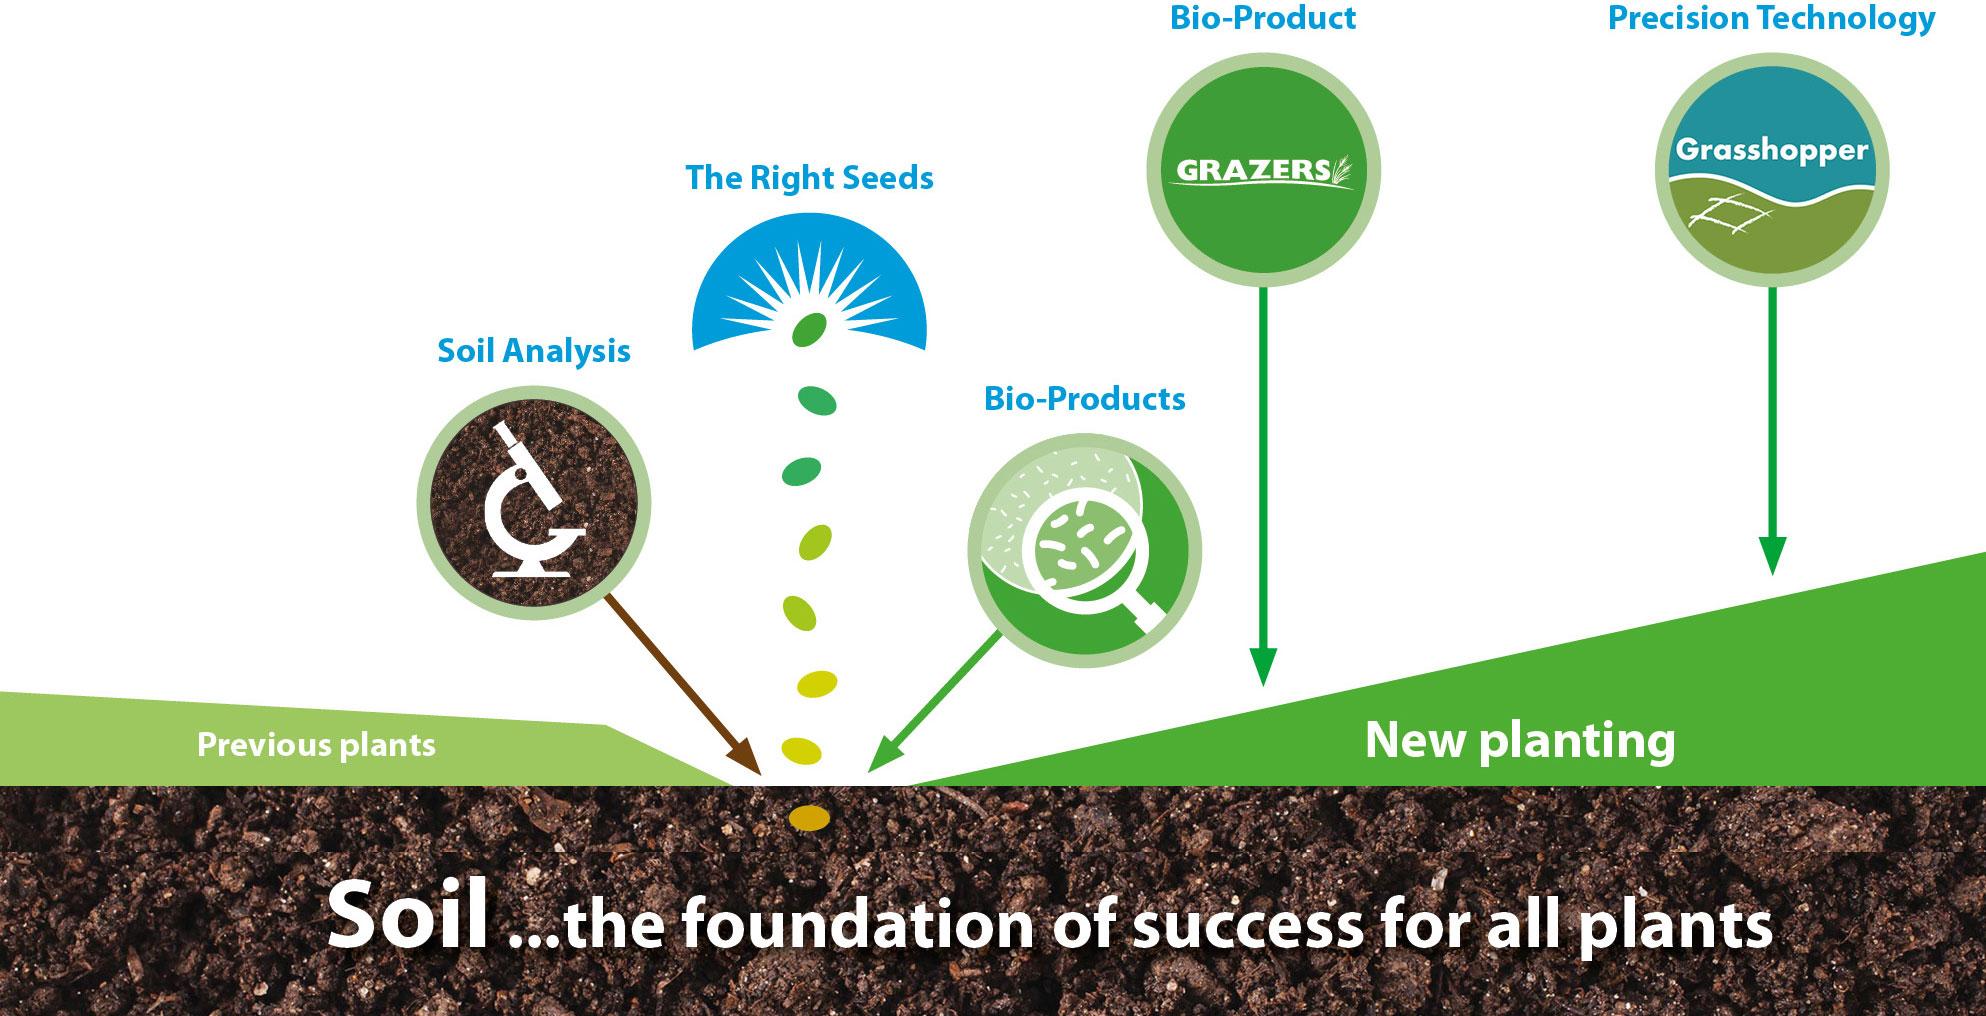 Planting Ideas Infographic